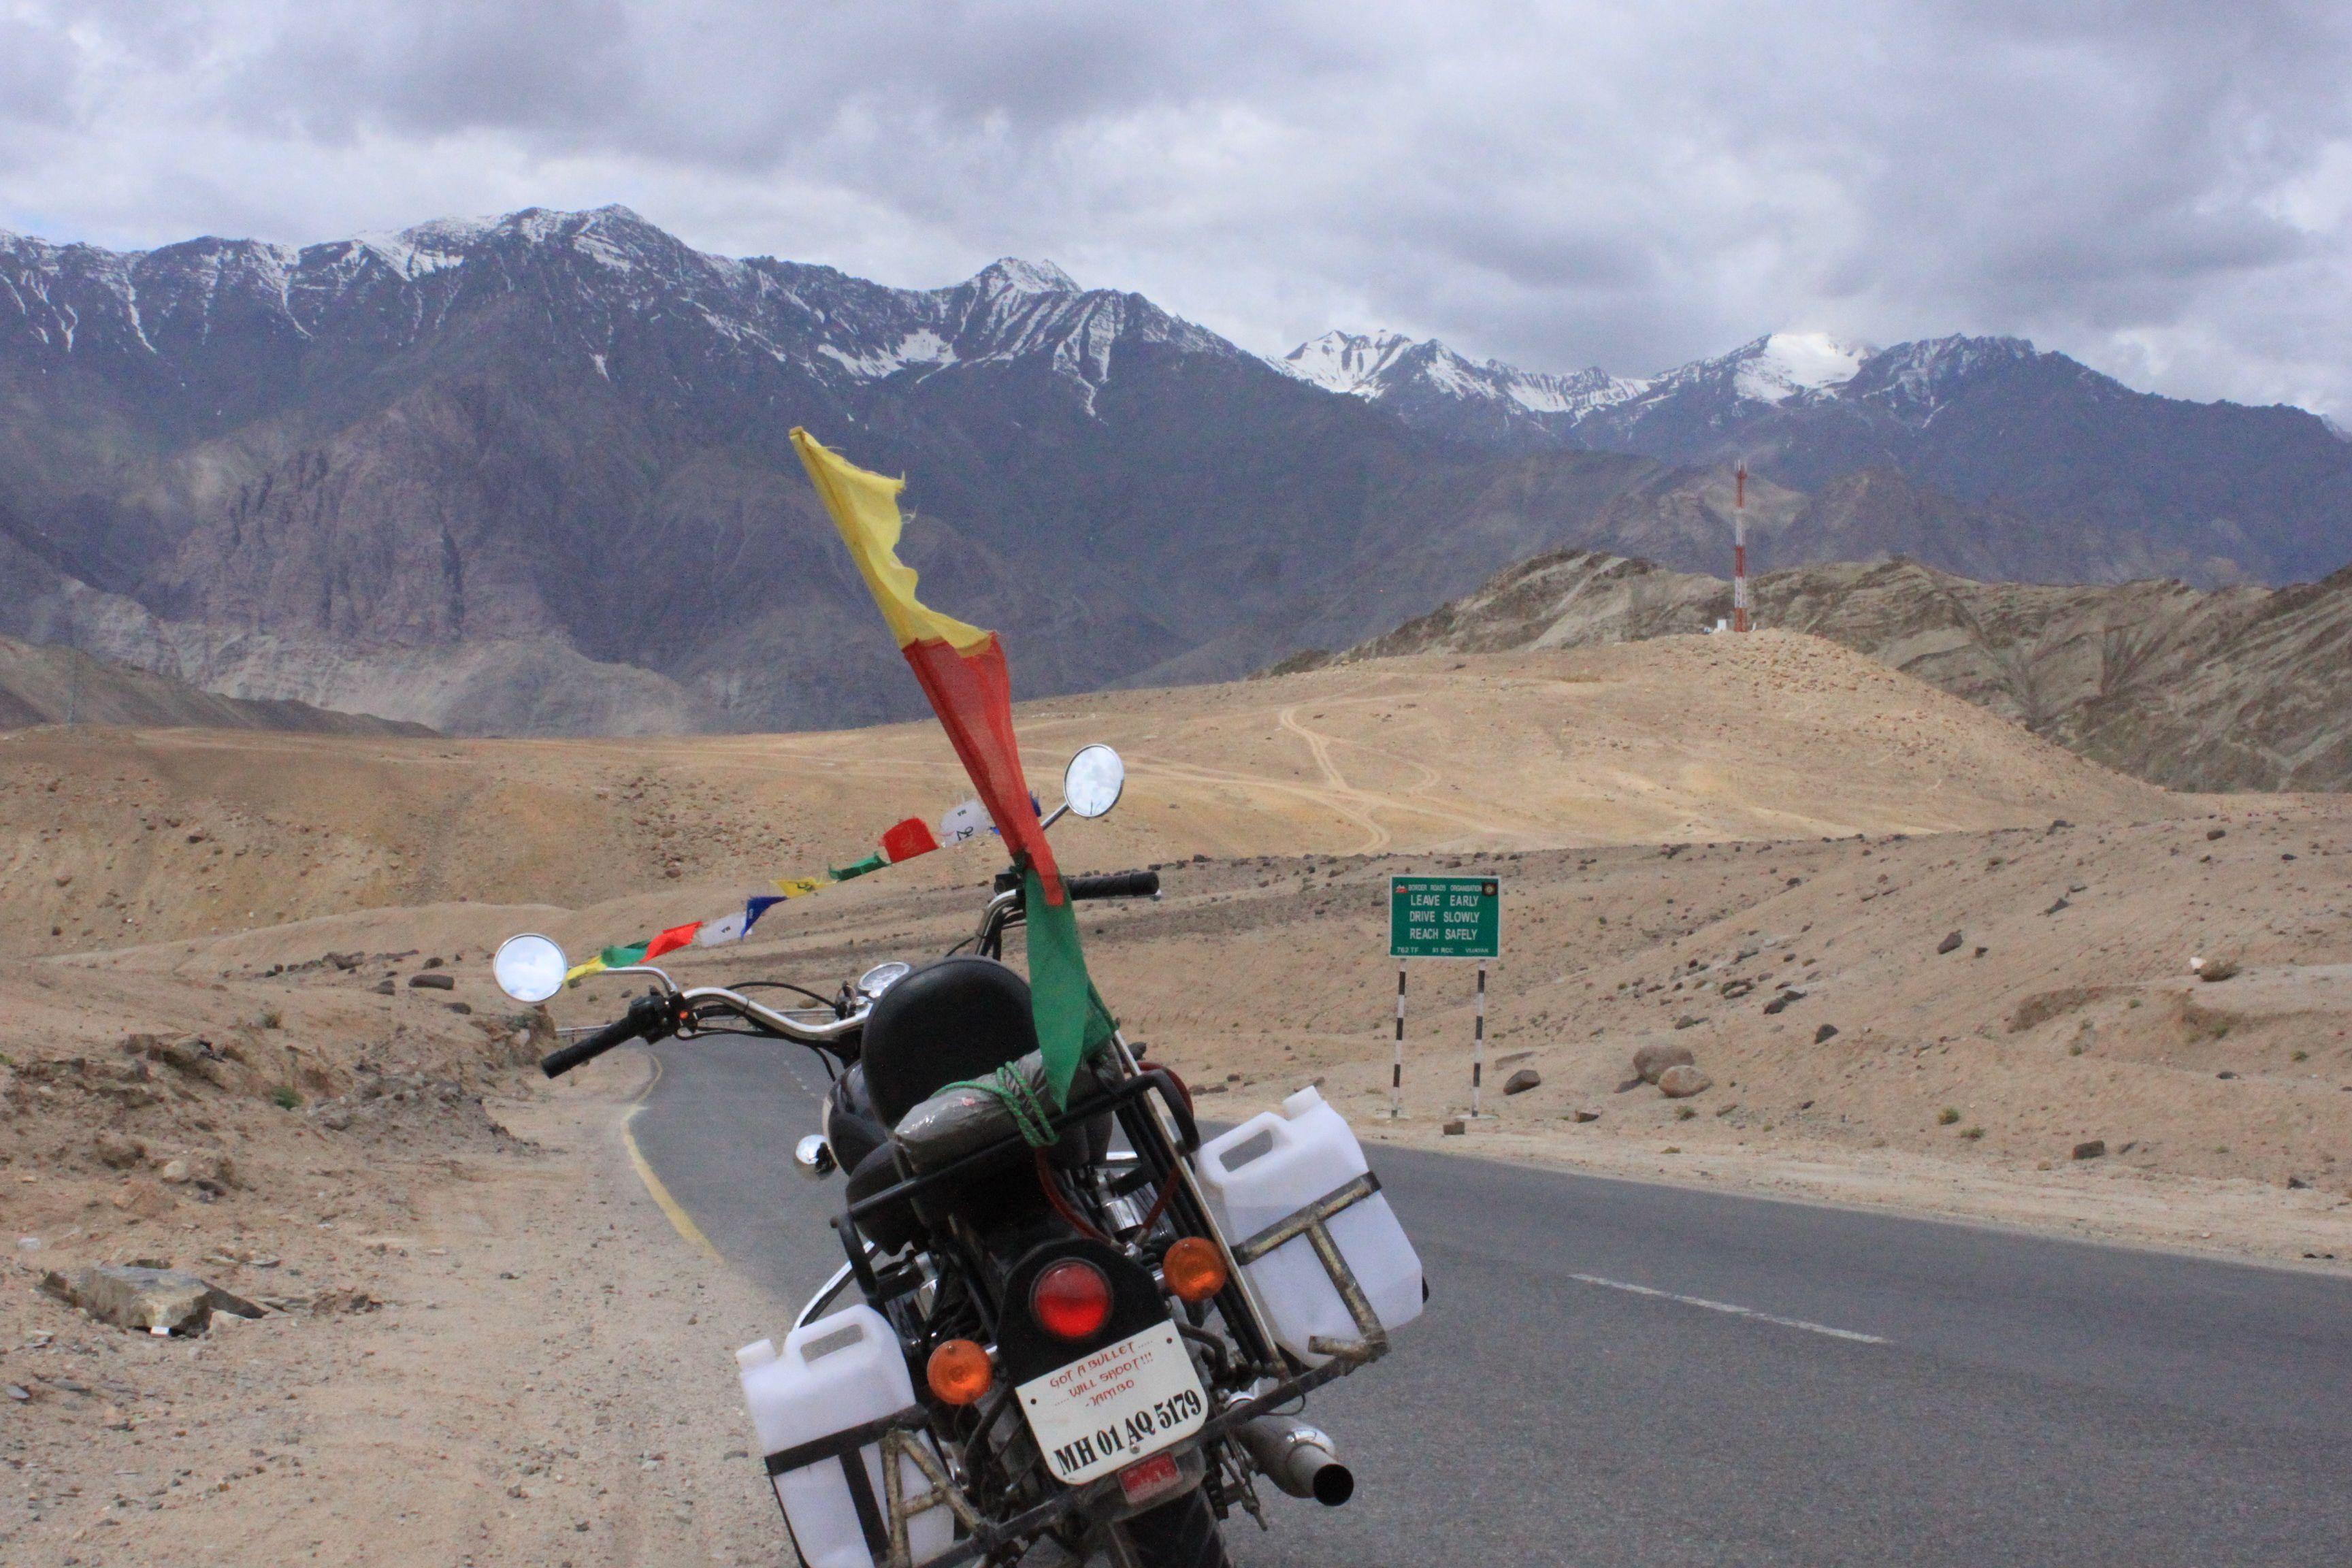 Manali To Leh Bike Trip From Delhi 2020 Bike Trips Leh Ladakh